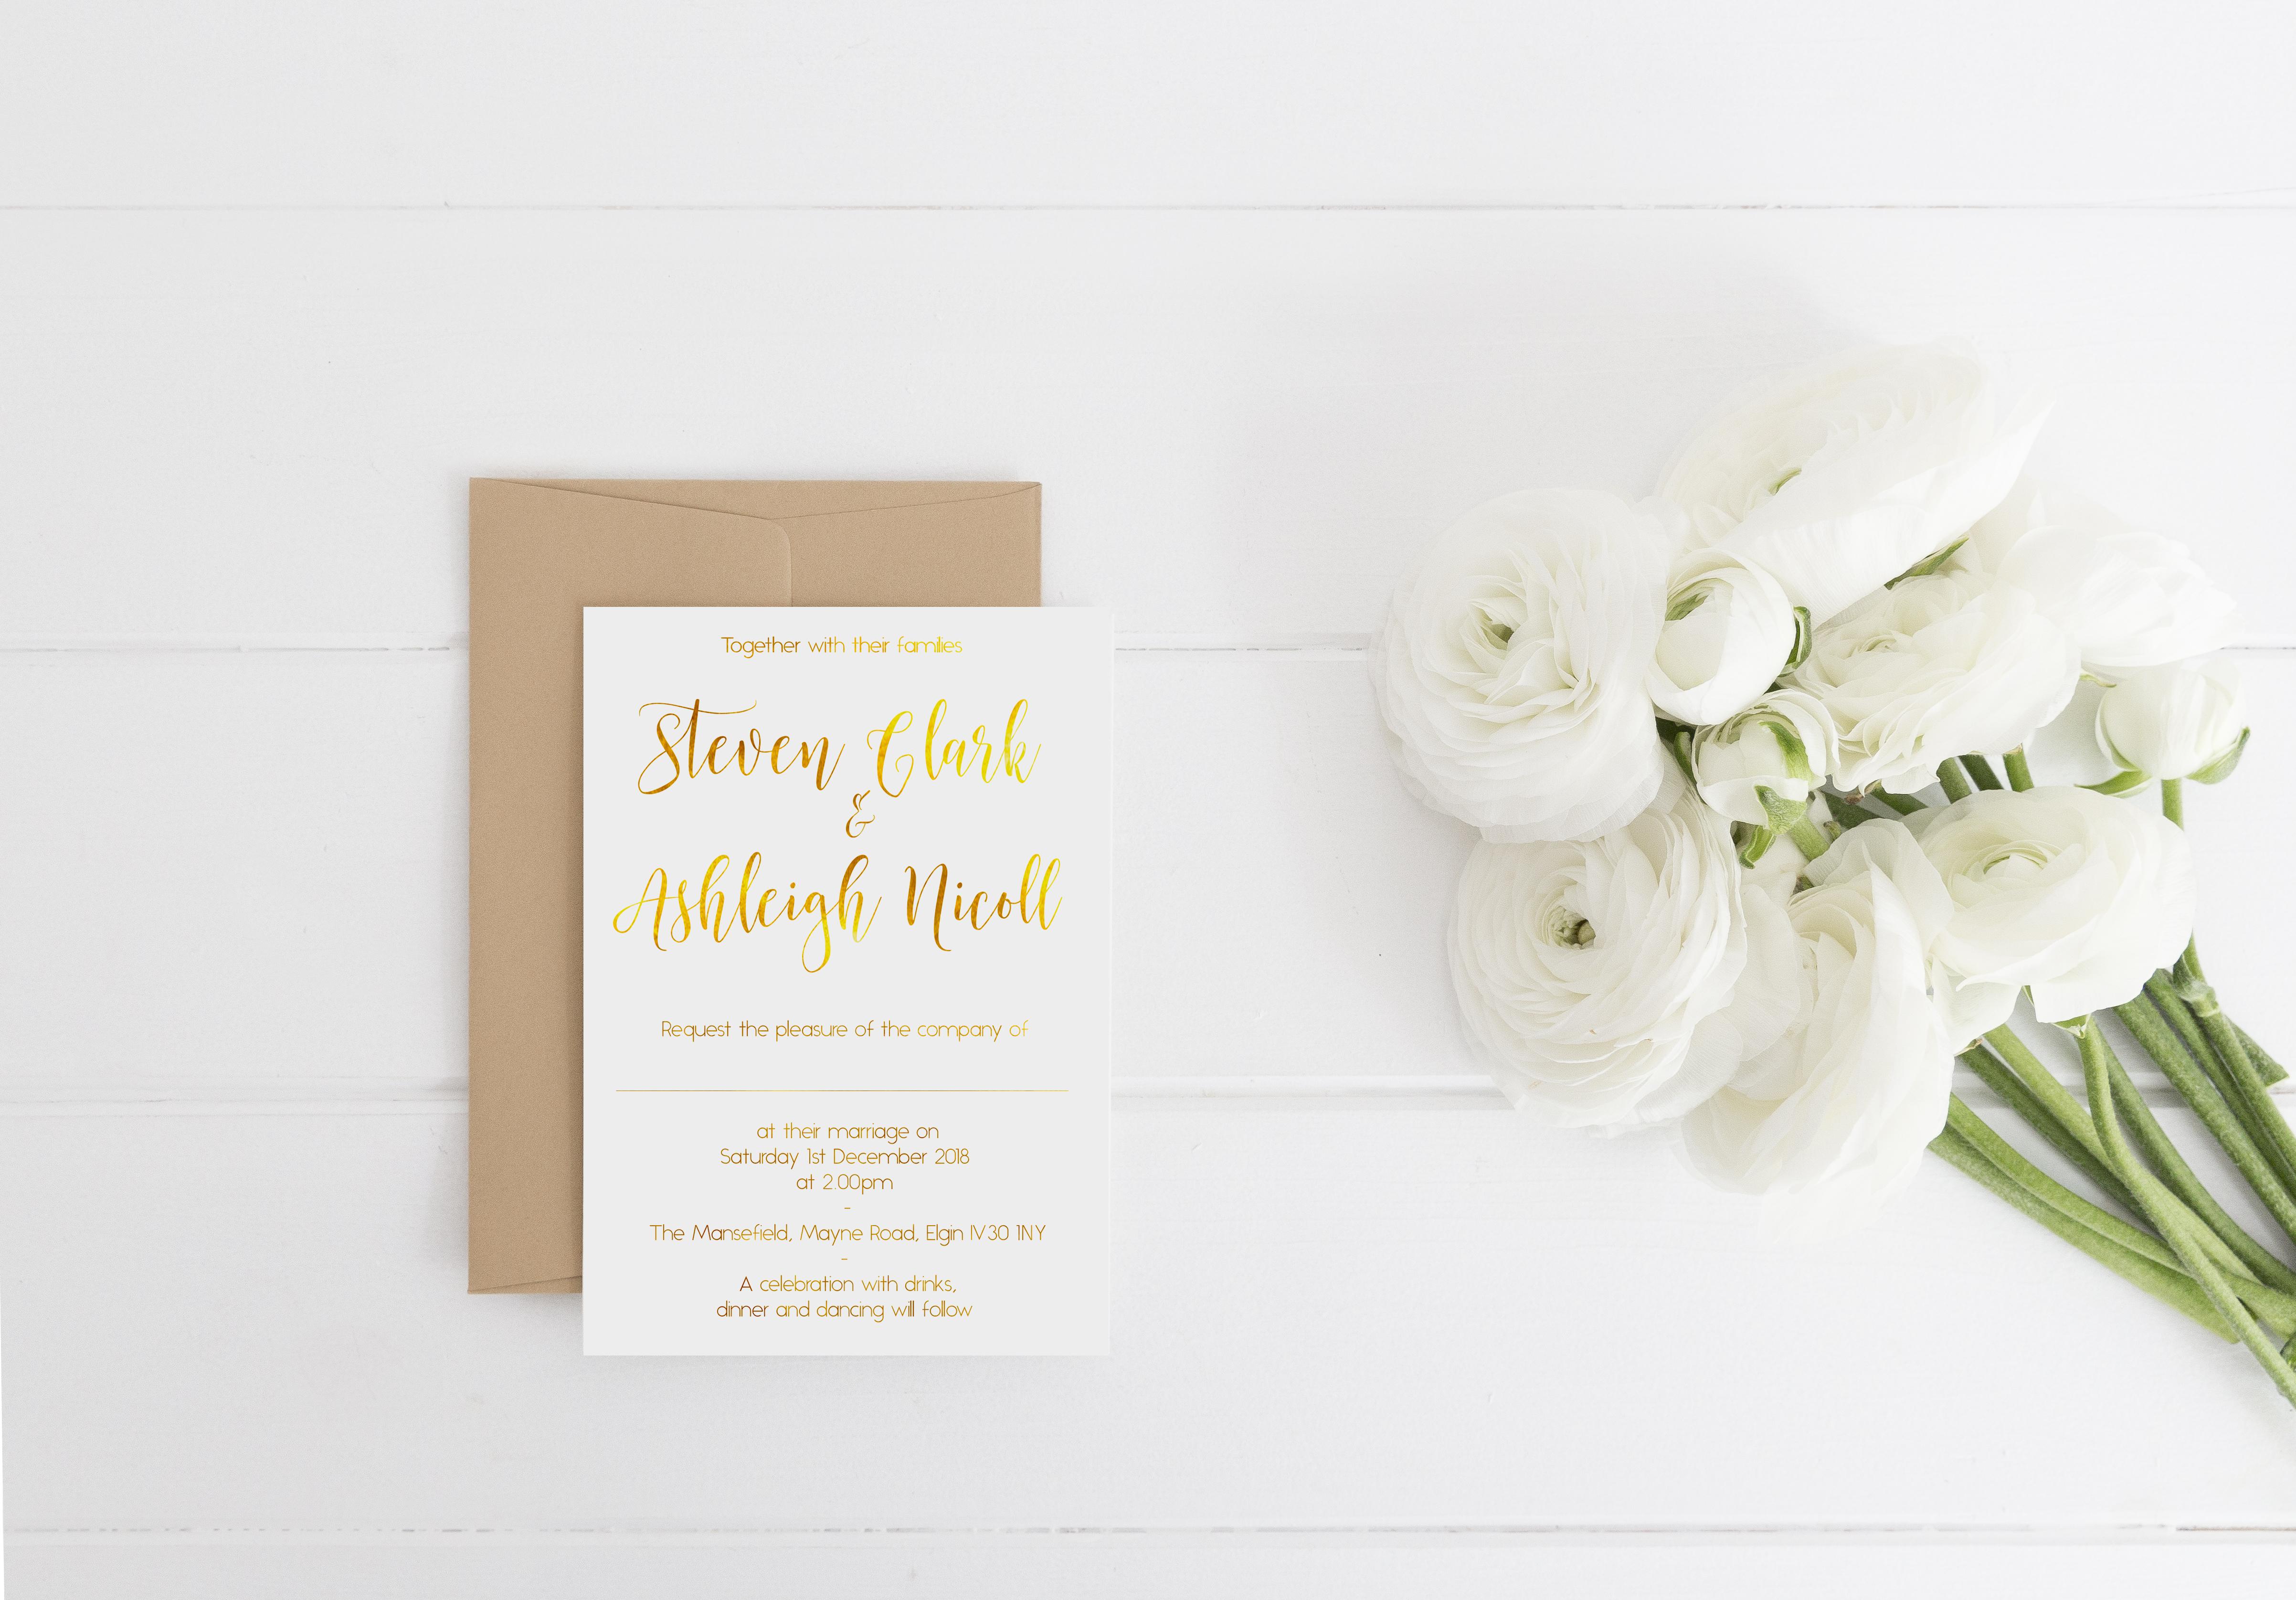 Steven and Ashleigh Invitation